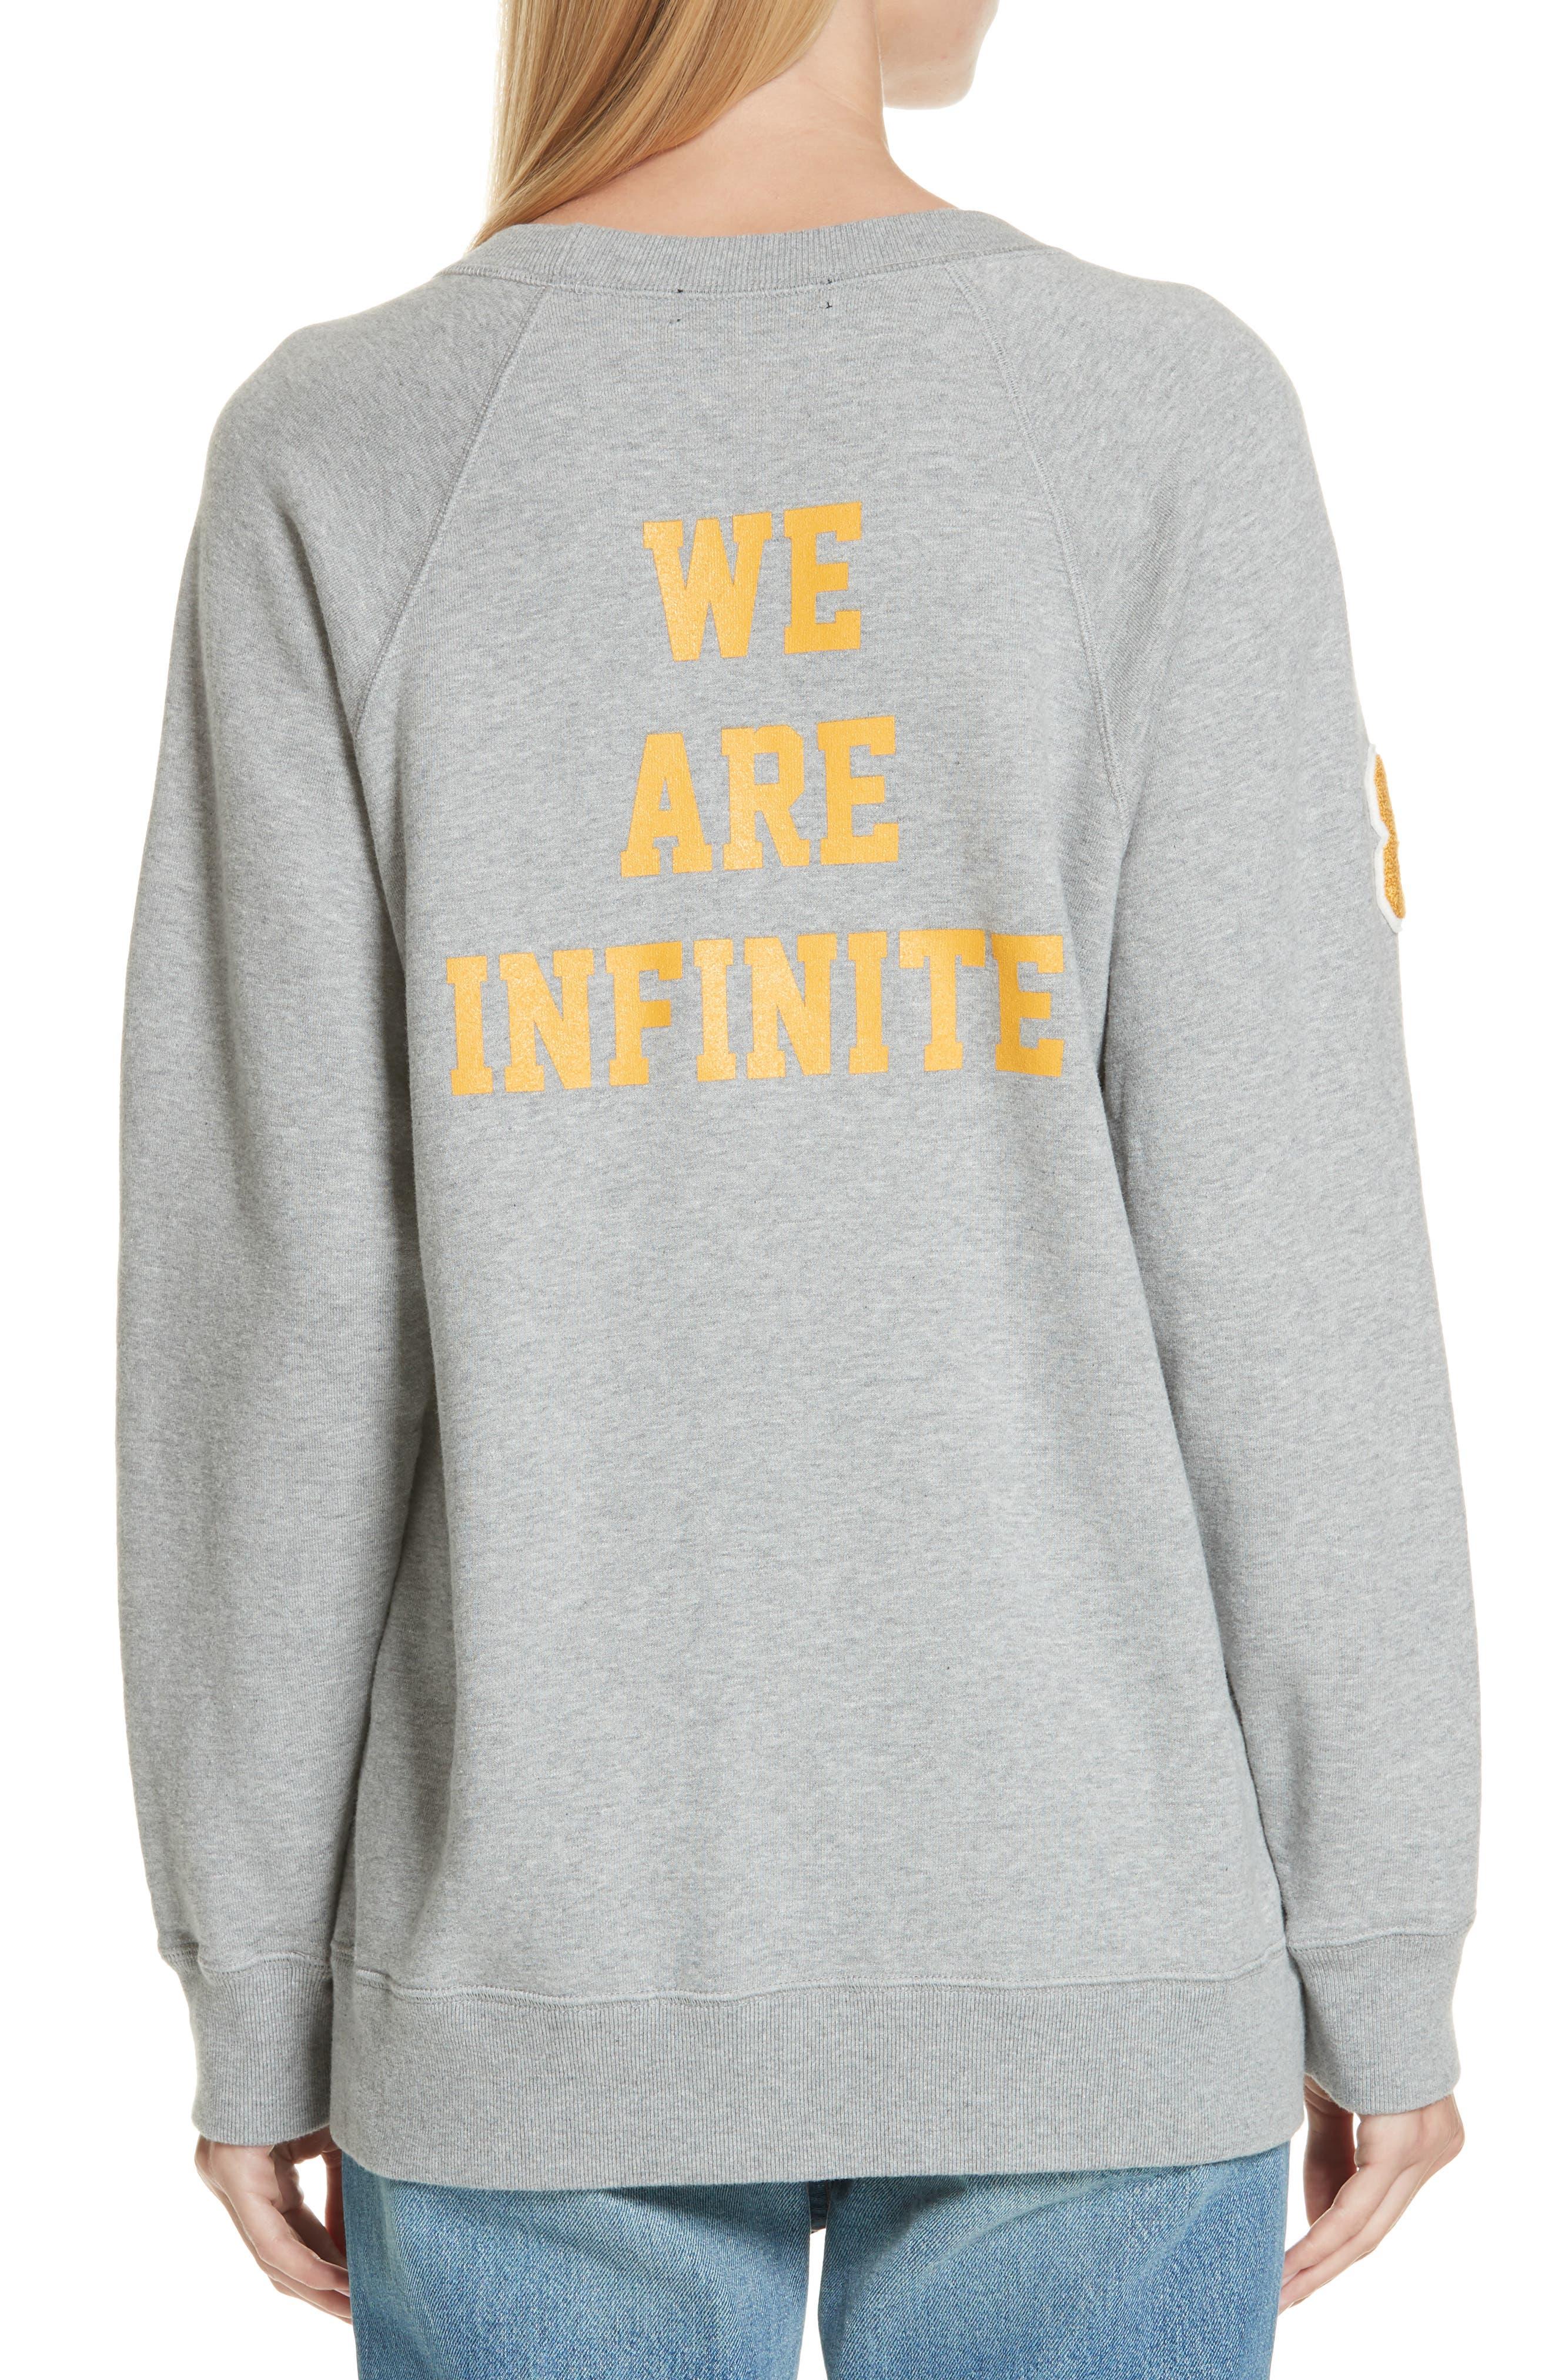 Unbroken Innocence Sweatshirt,                             Alternate thumbnail 2, color,                             B TOP GRAY